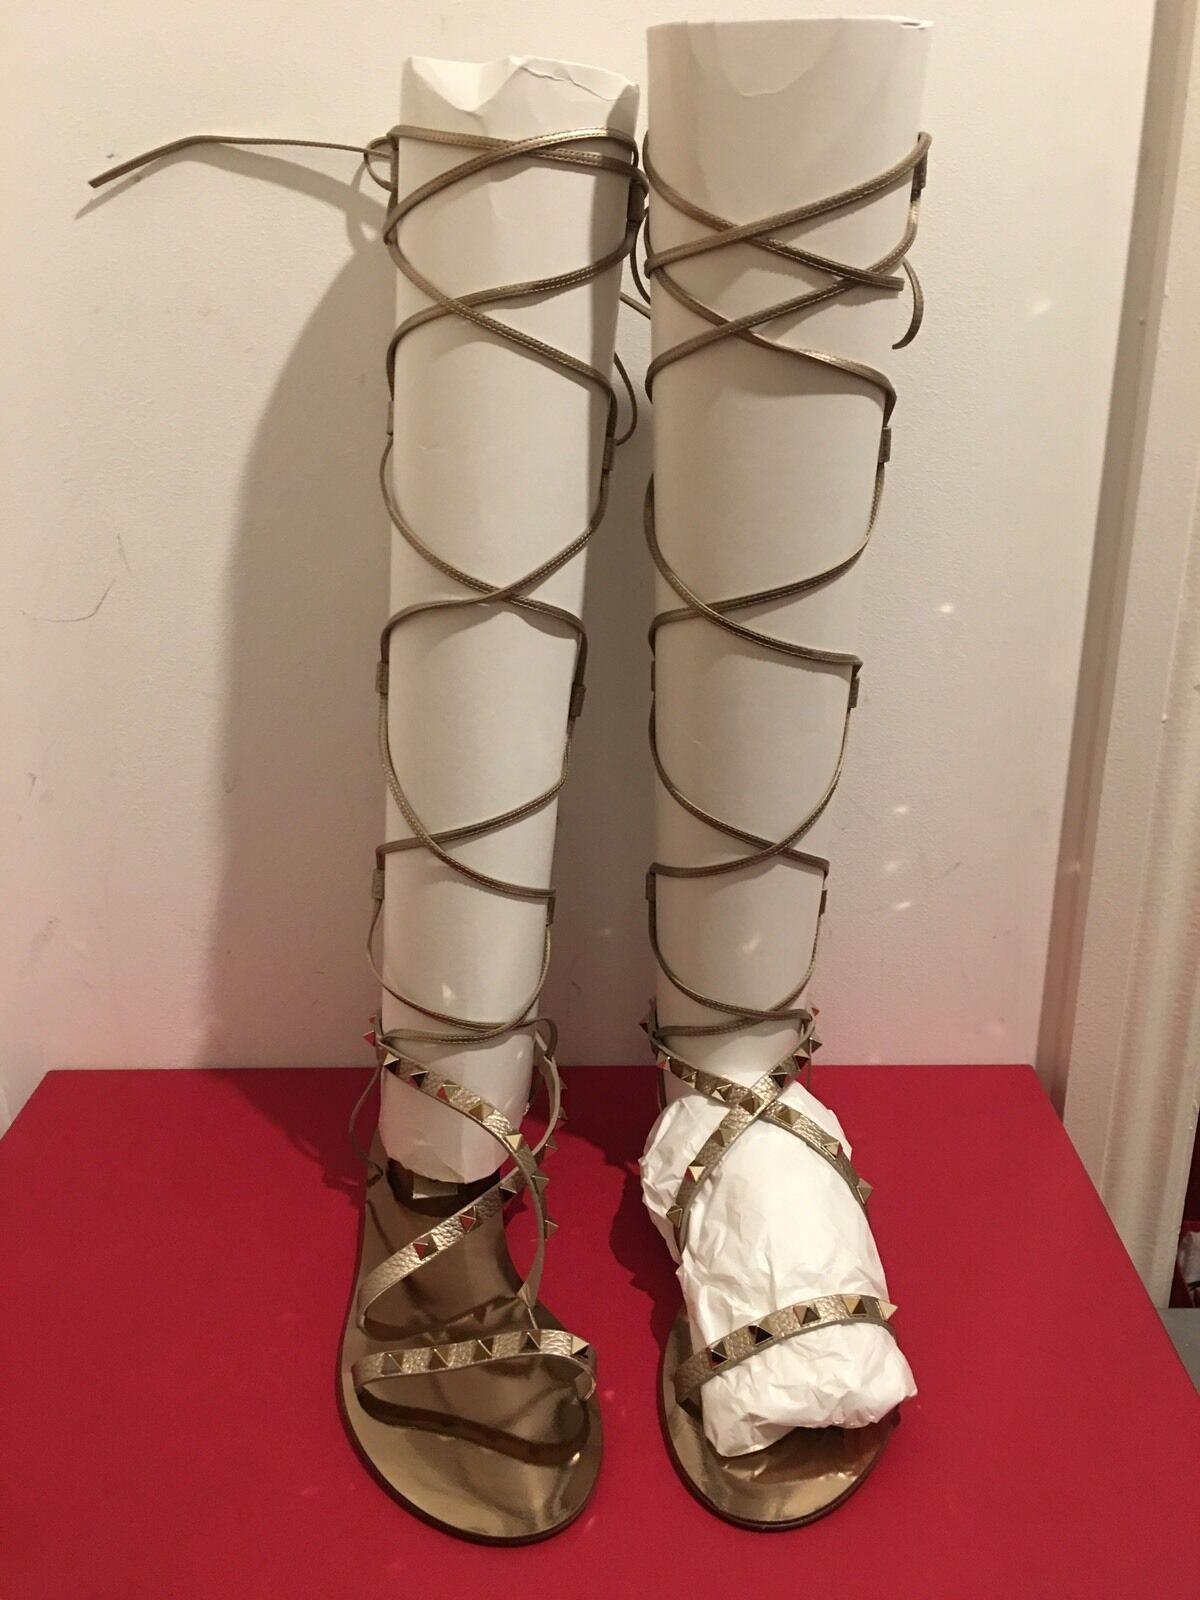 VALENTINO GARAVANI Rockstud Knee Length Gladiator Sandales UK 4/EU 37